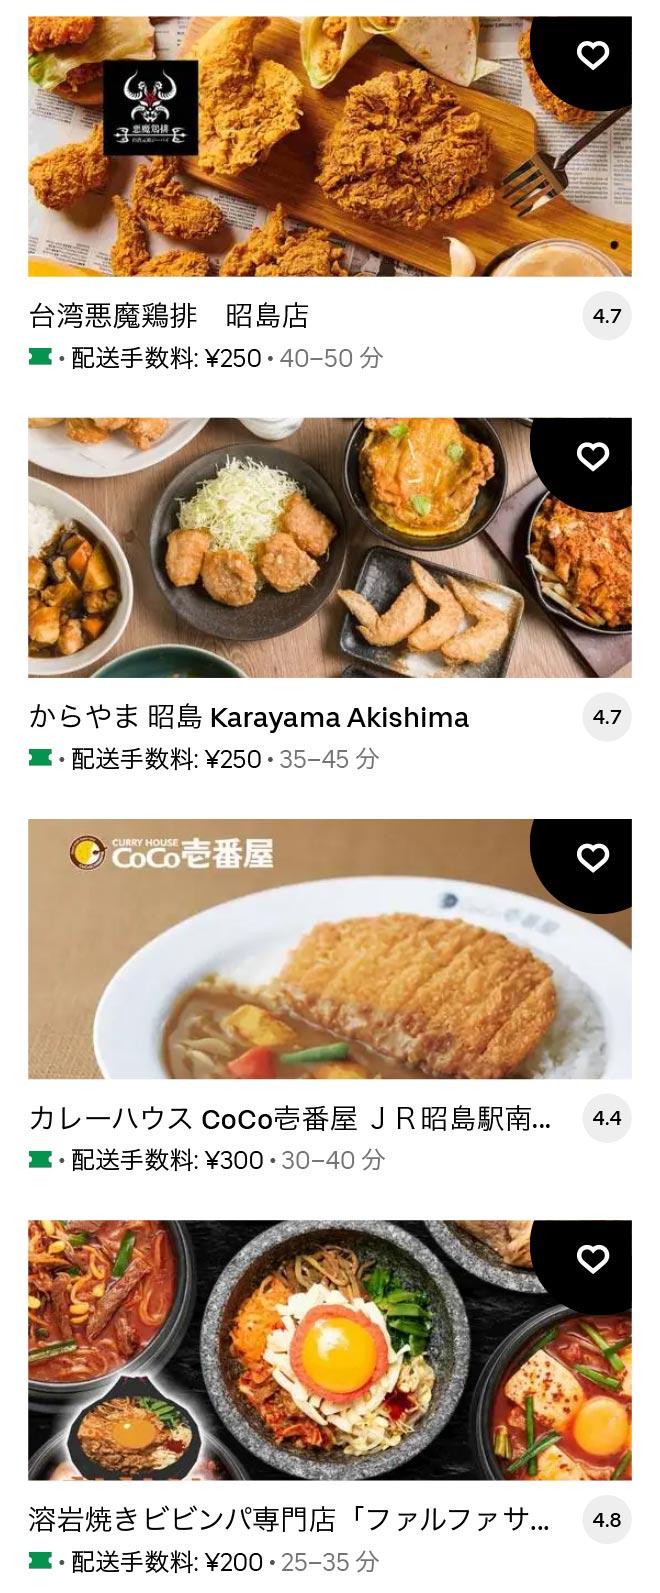 U musashi murayama 2106 02